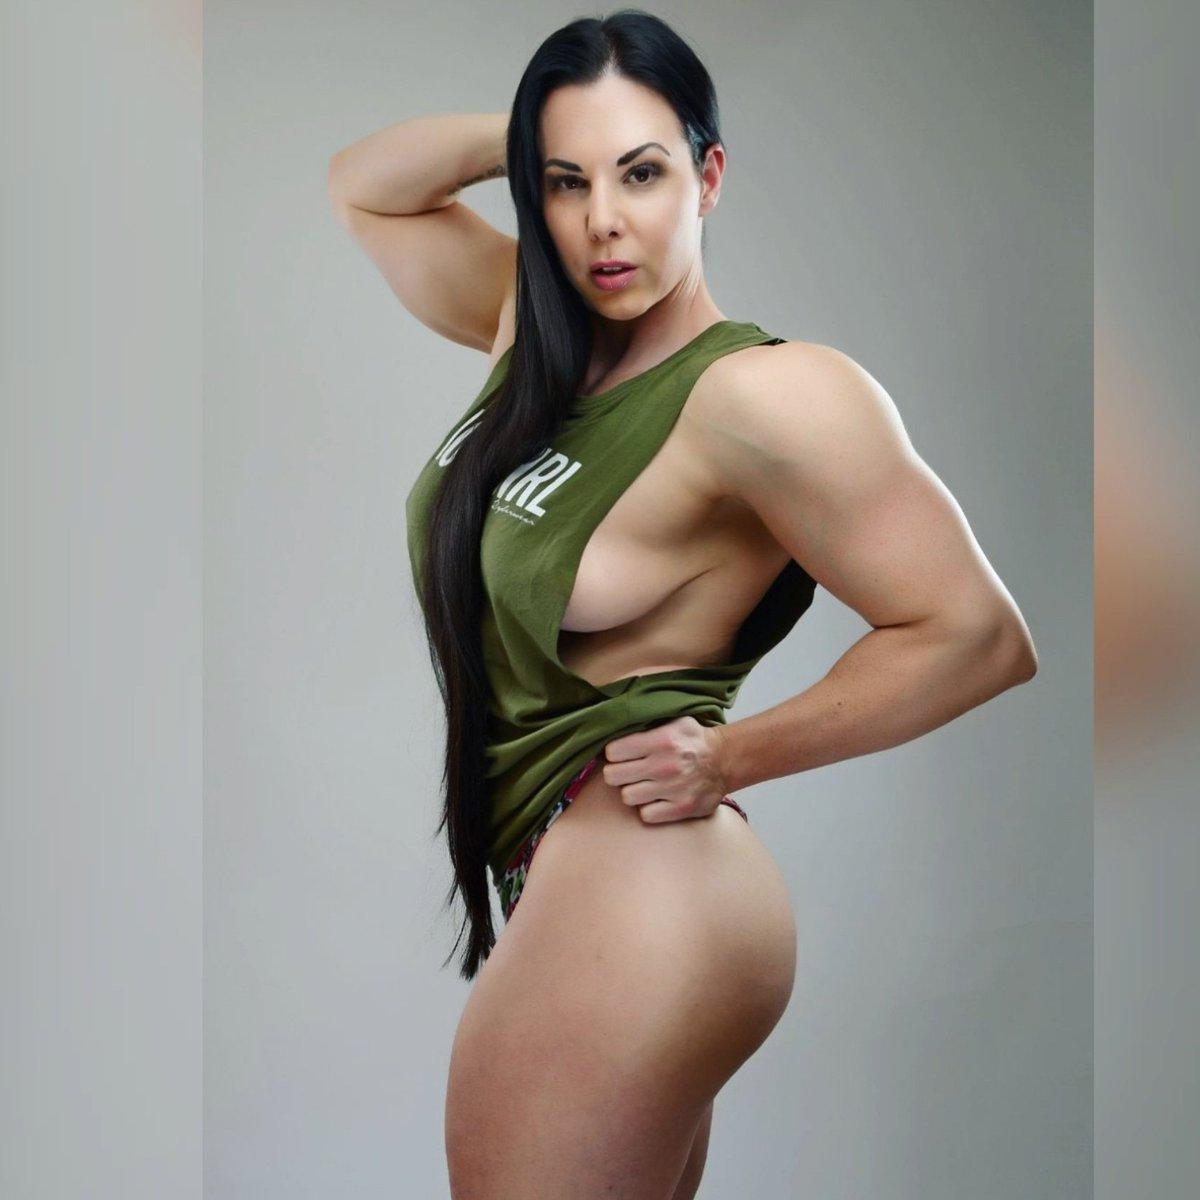 Hot Lesbian Girls Erotic Massage Parlor